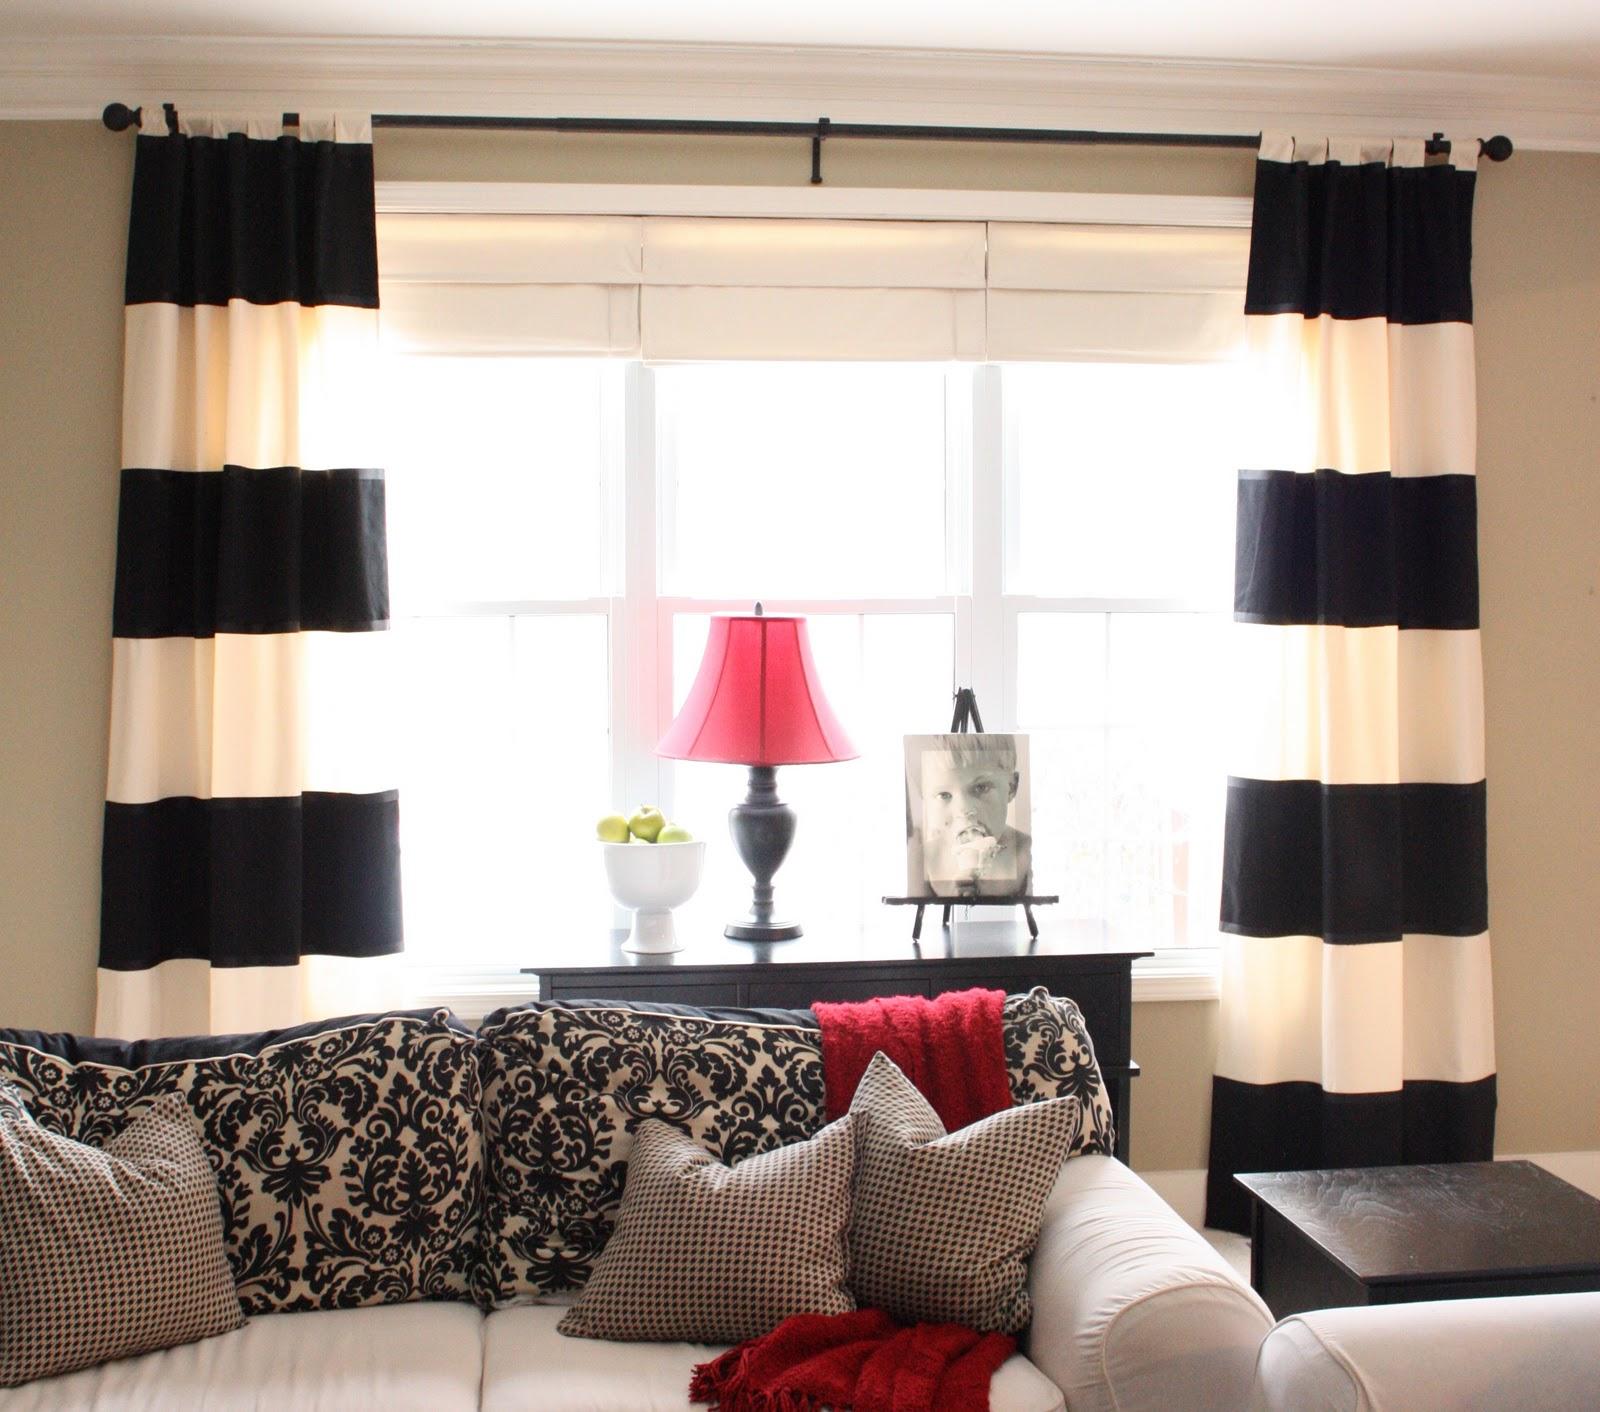 Drapes for living room - 35 methods to make your room seem bigger ...